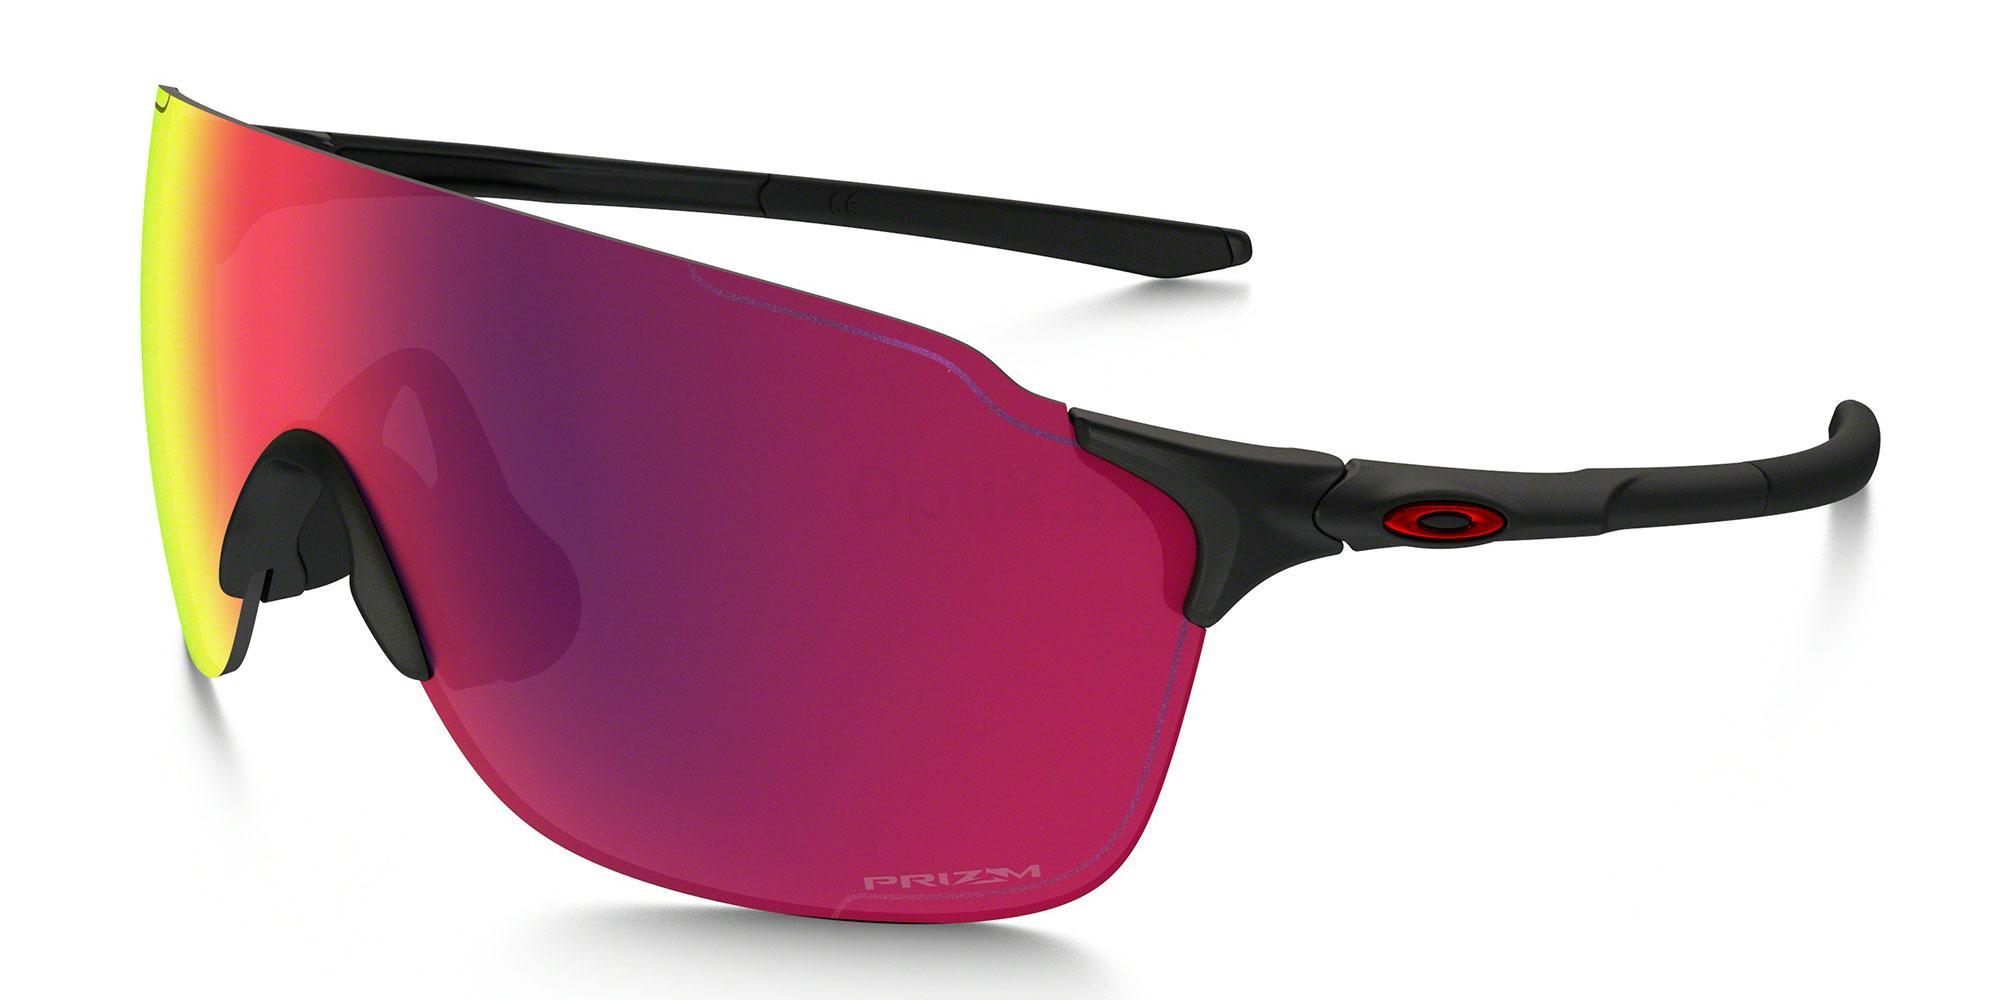 938605 OO9386 EVZERO STRIDE Sunglasses, Oakley